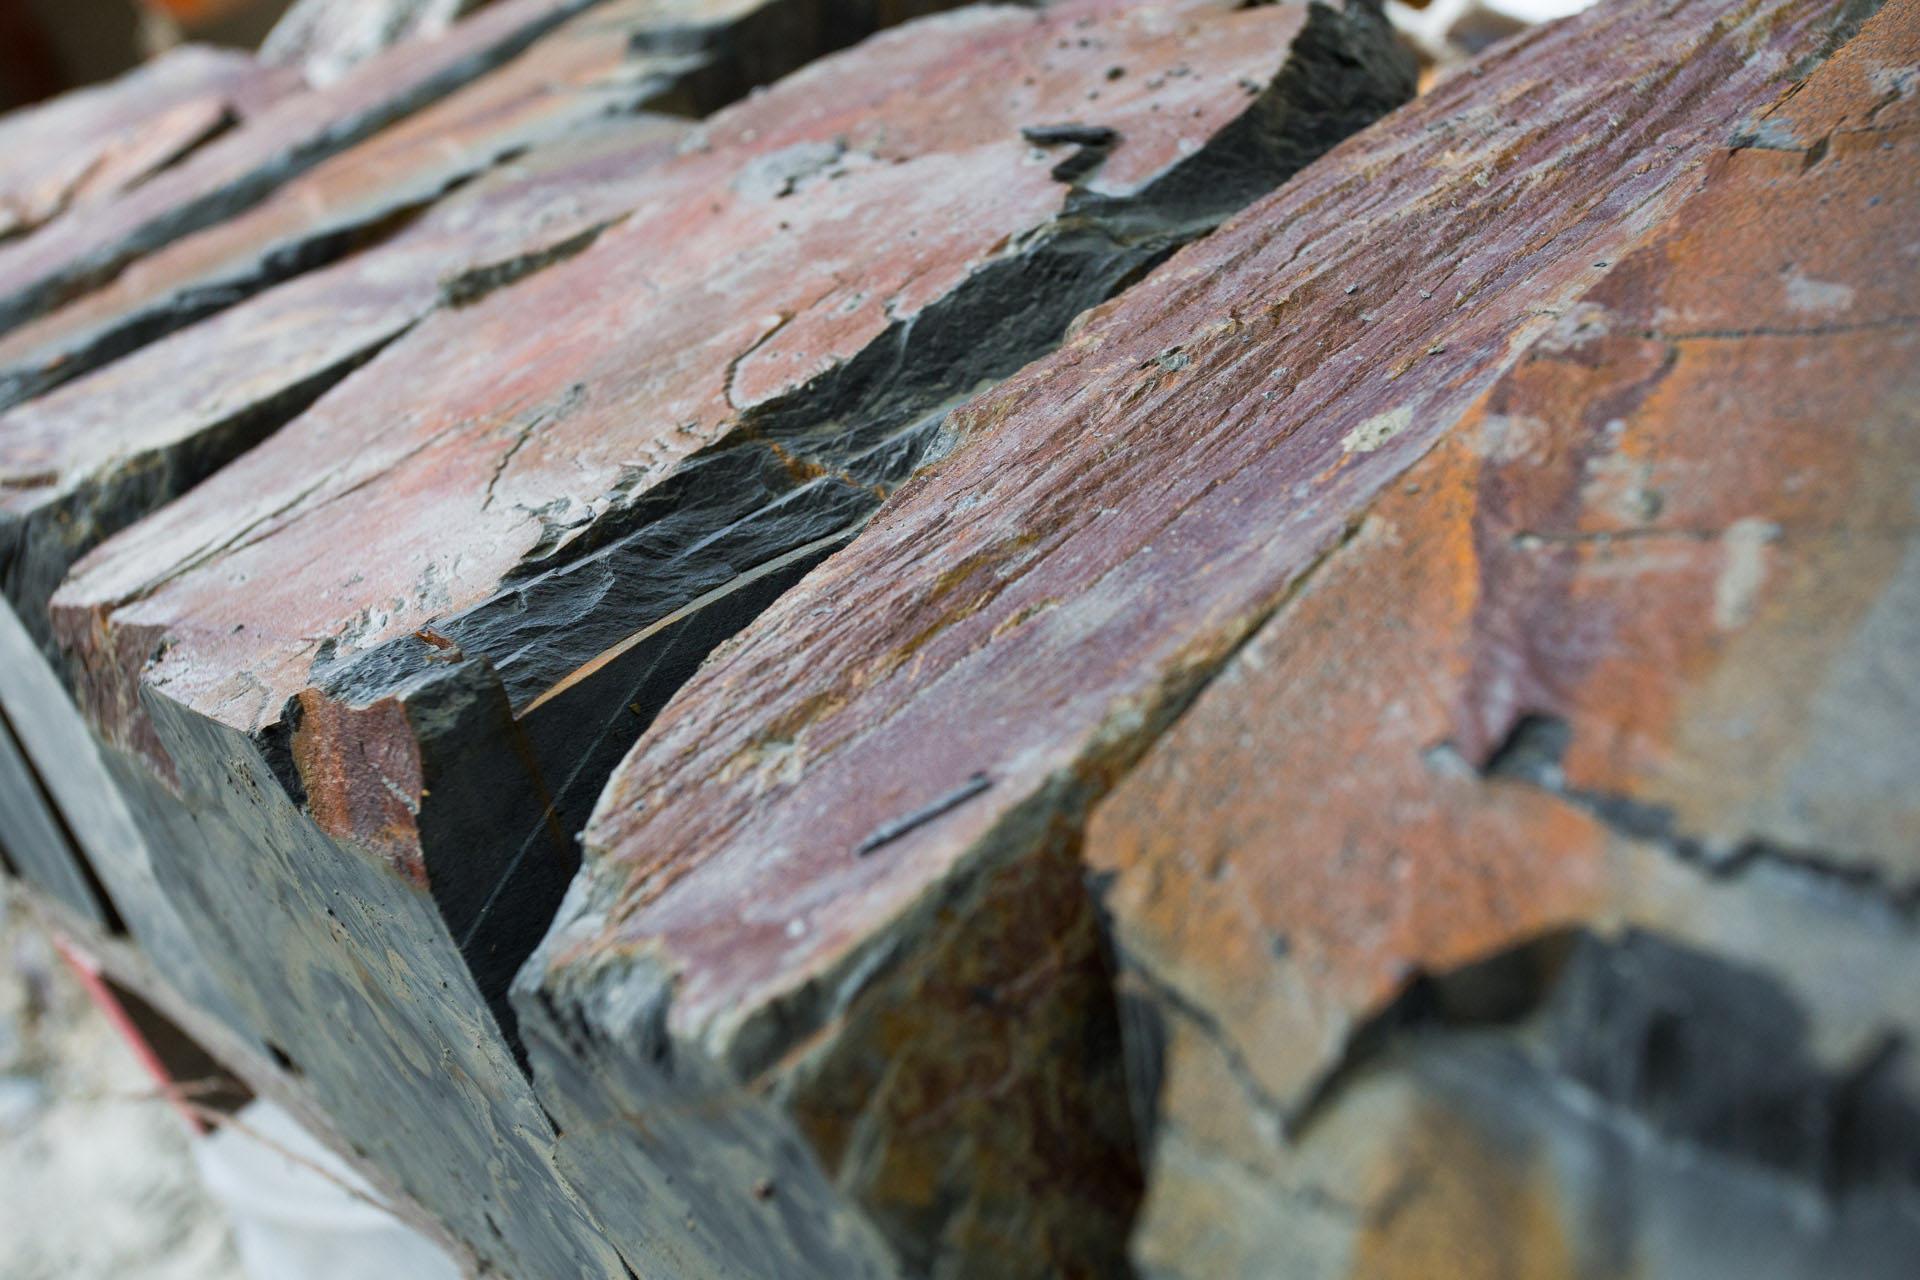 Rustic stone